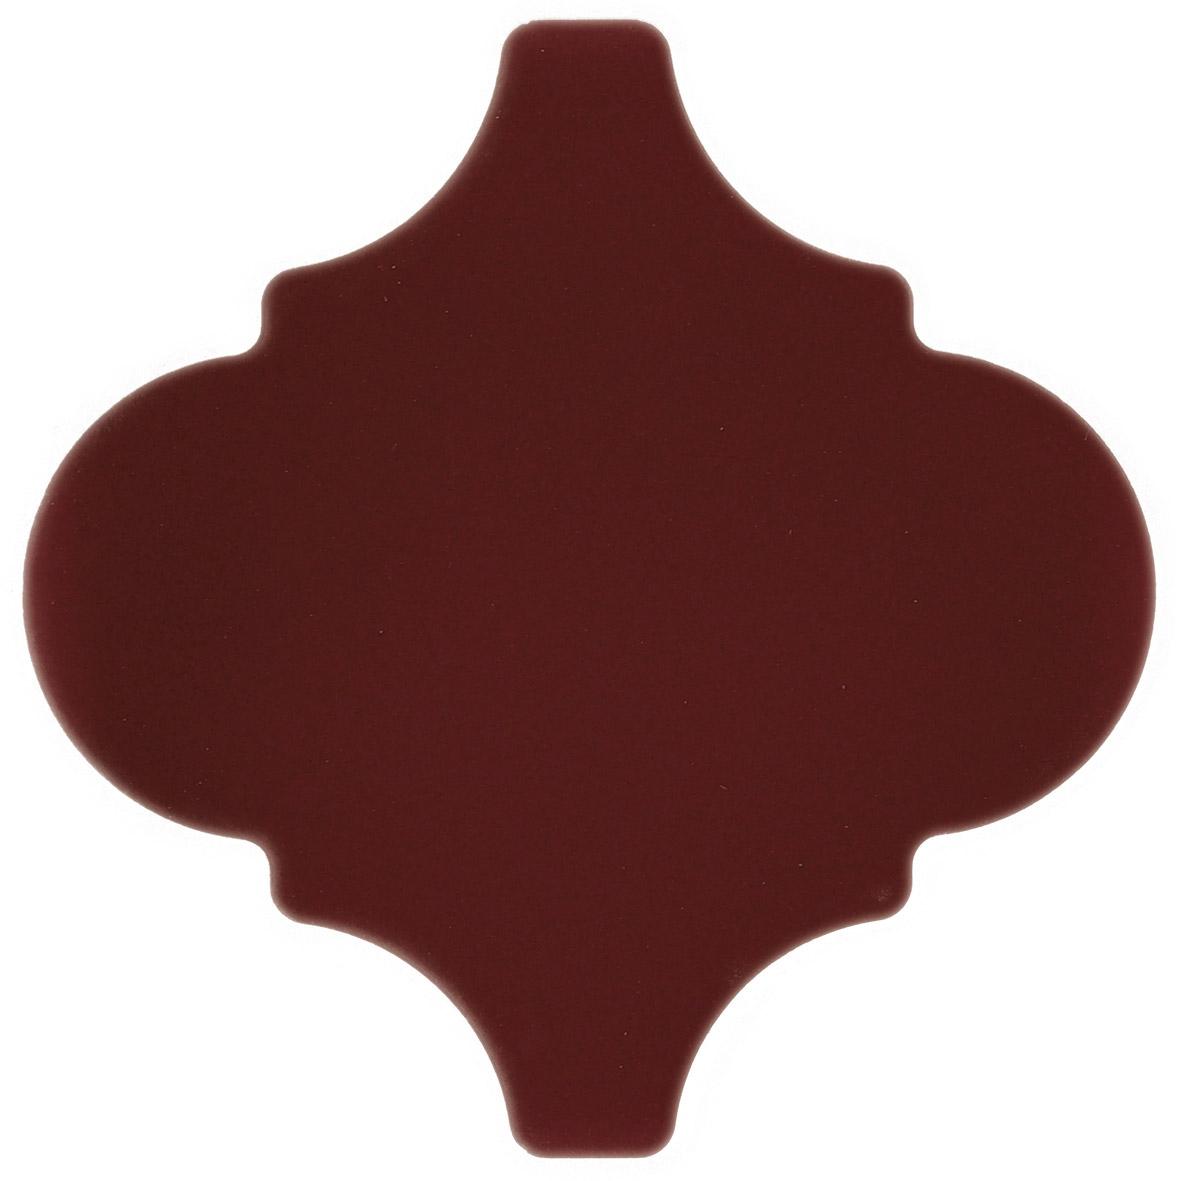 ARB3500, Arabesque, Violetti, seina